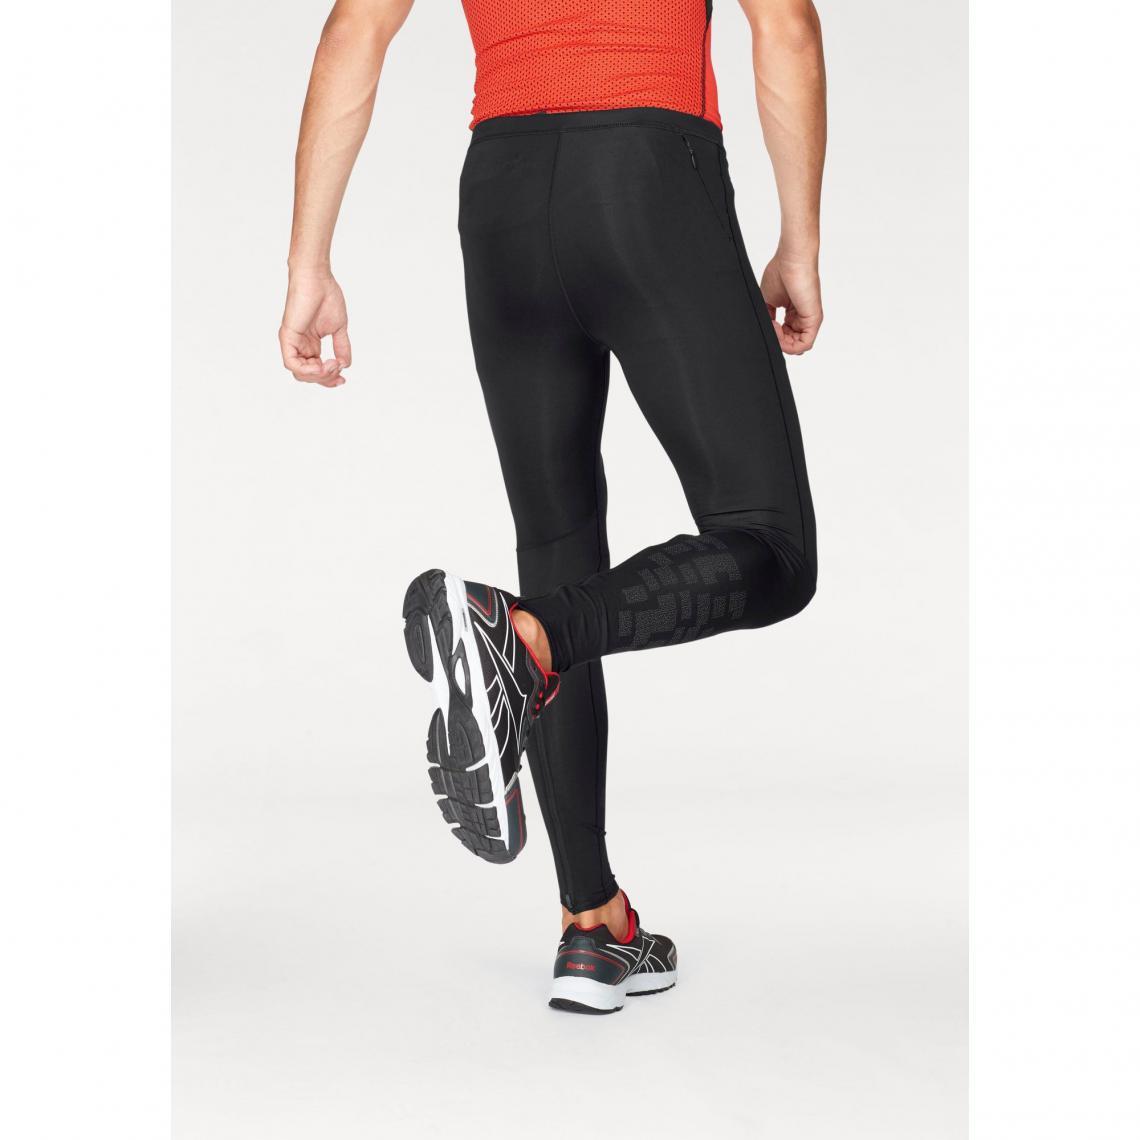 Supernova Homme Sport Zippée Men De Adidas Tight Poche Long Legging UwCgHWqOn